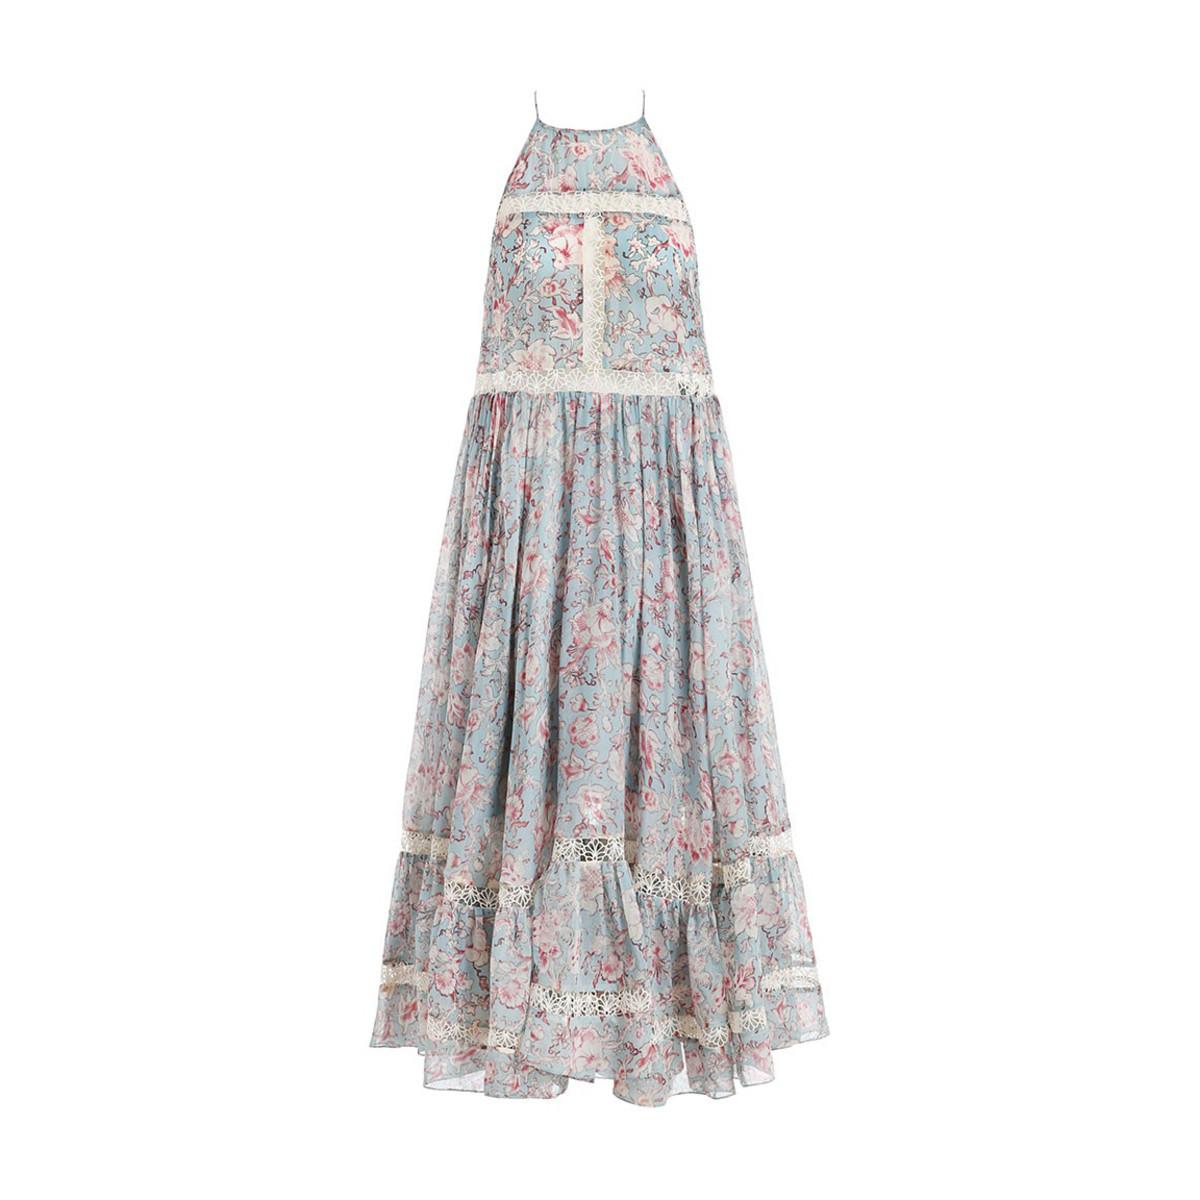 1.8784dgem.flo.gemma-folk-floral-sun-dress-withskirtlining-floral-flat.jpg